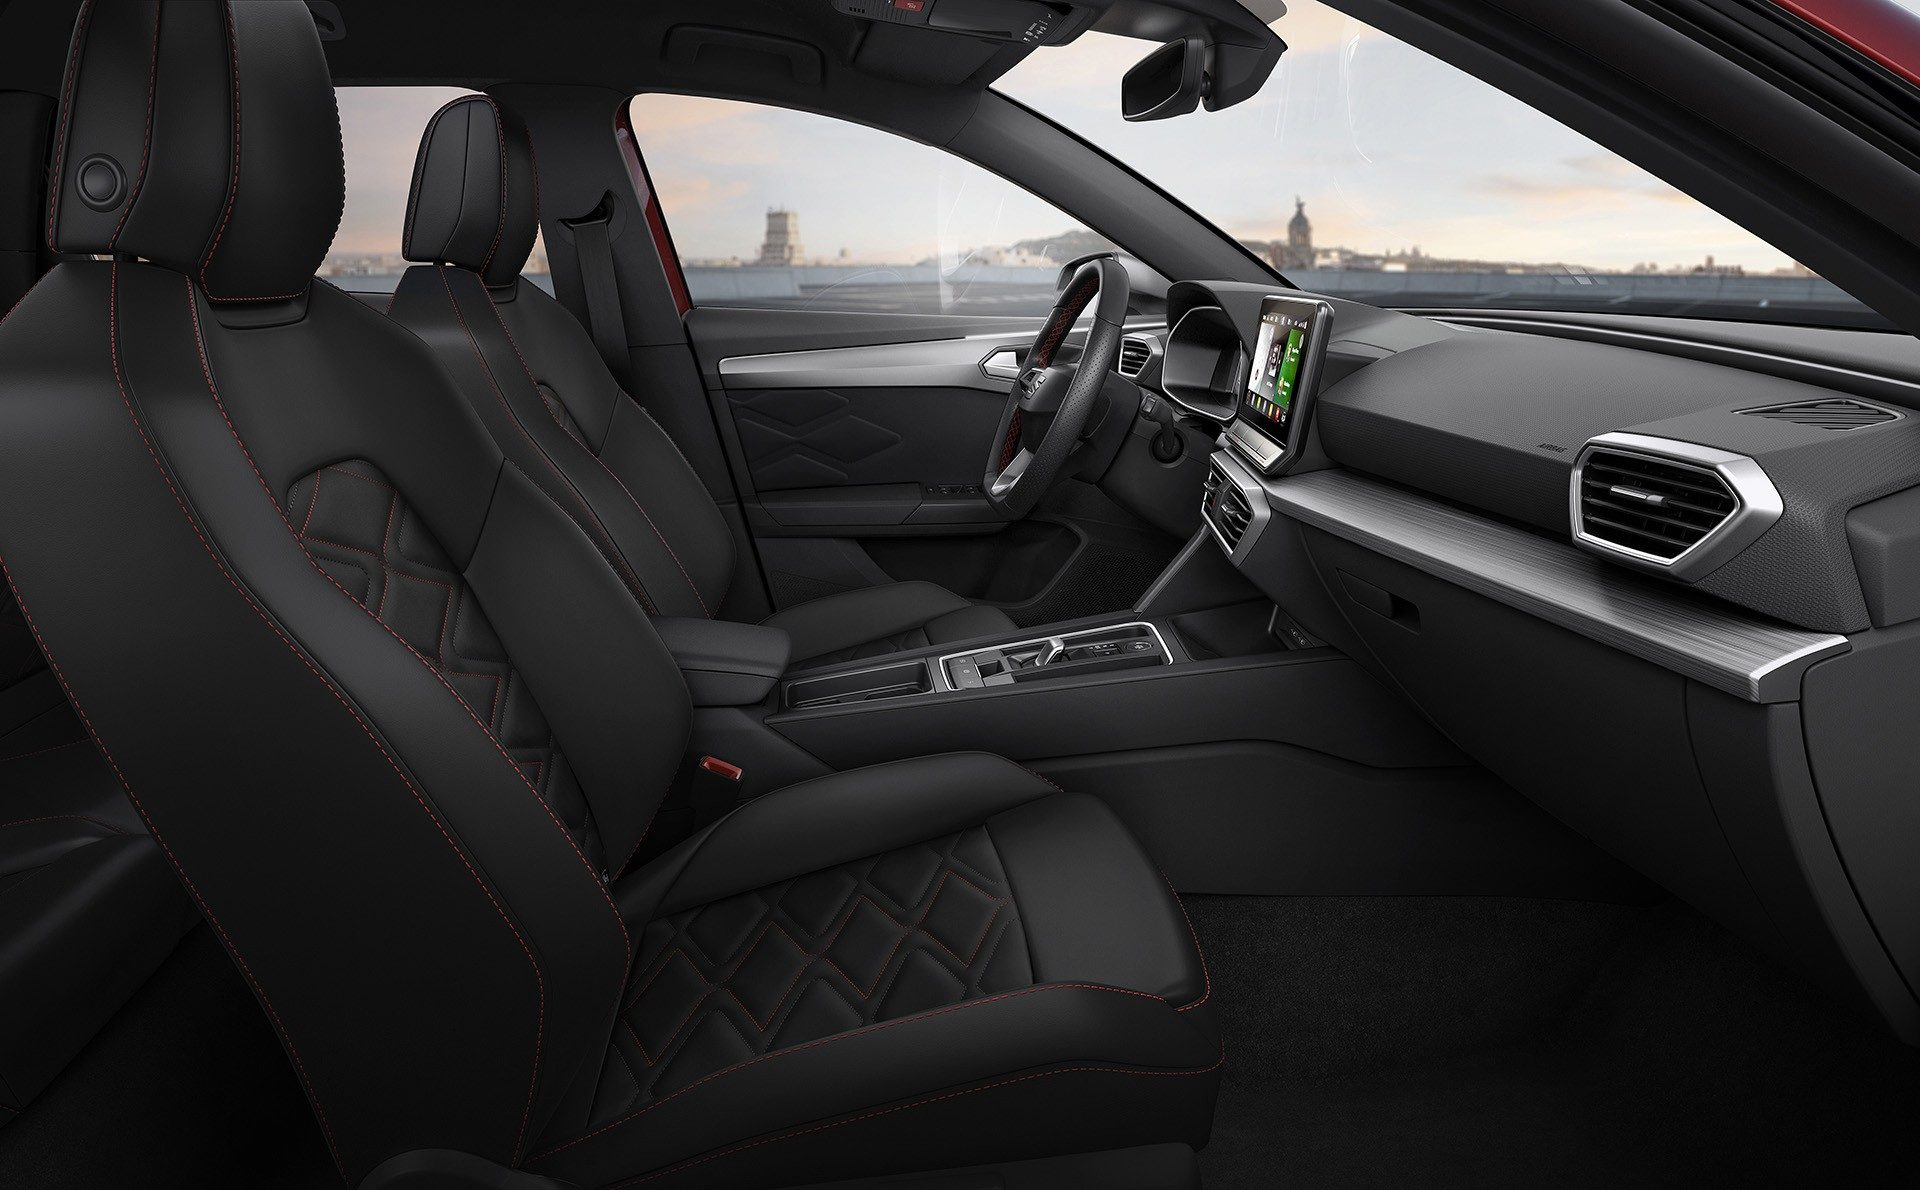 2020-Seat-Leon-Hatch-Estate-23